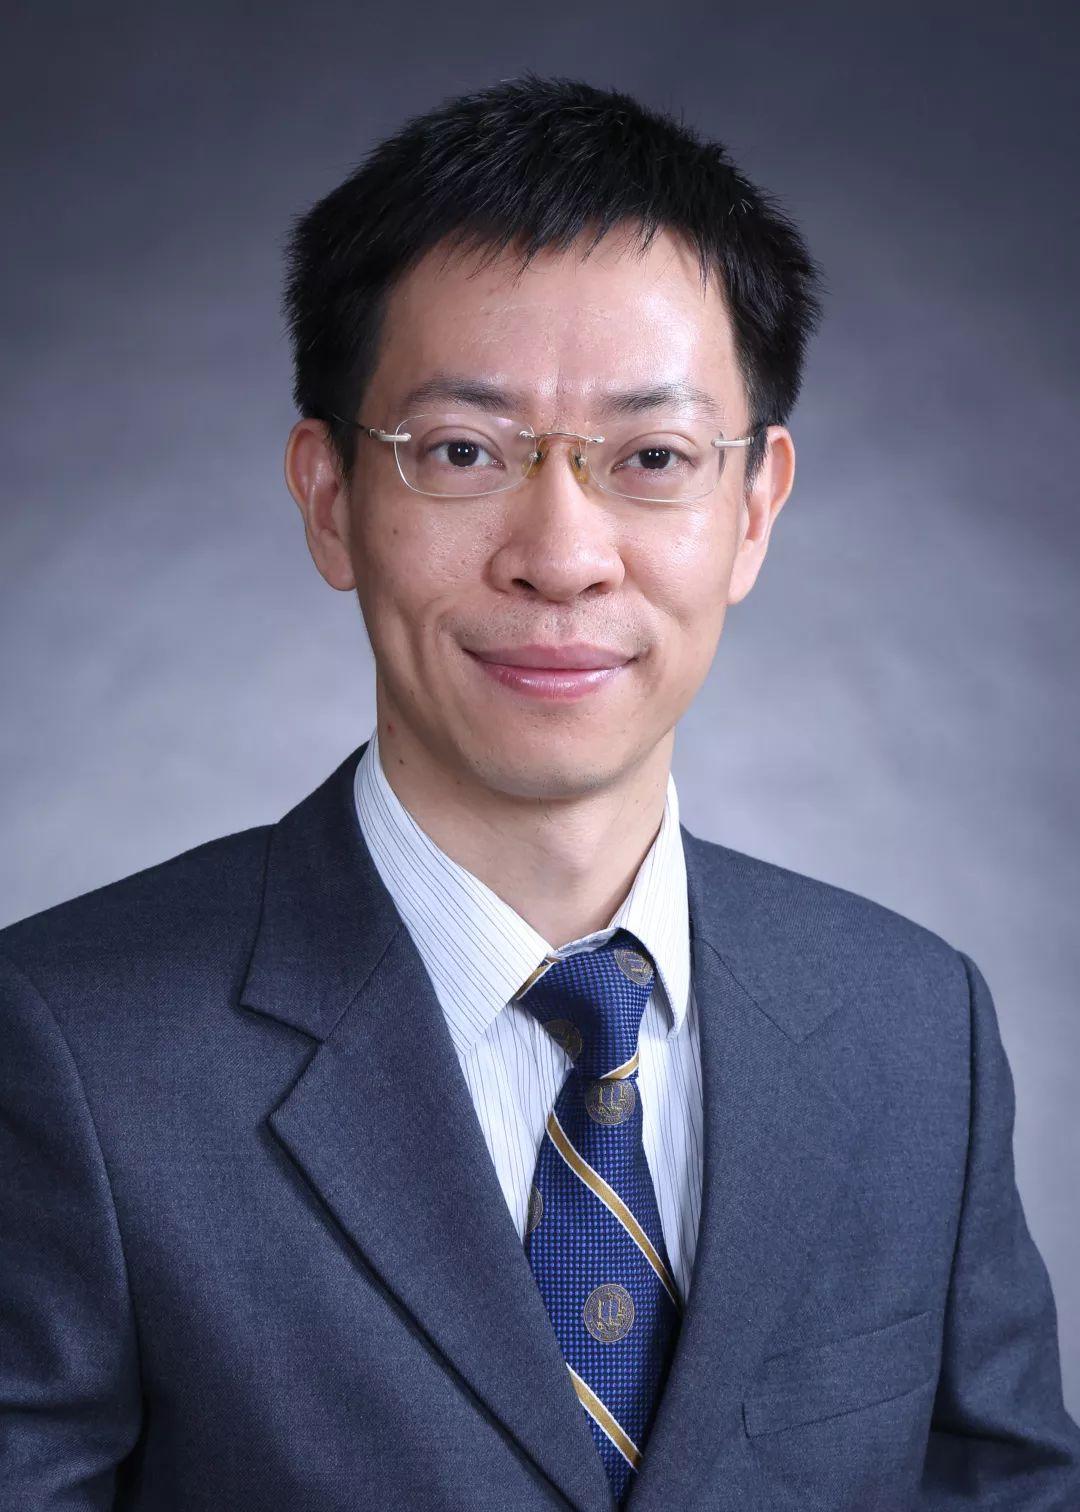 <b>【北大国发院EMBA论坛】第15期:余淼杰——中美贸易:挑战与预测</b>